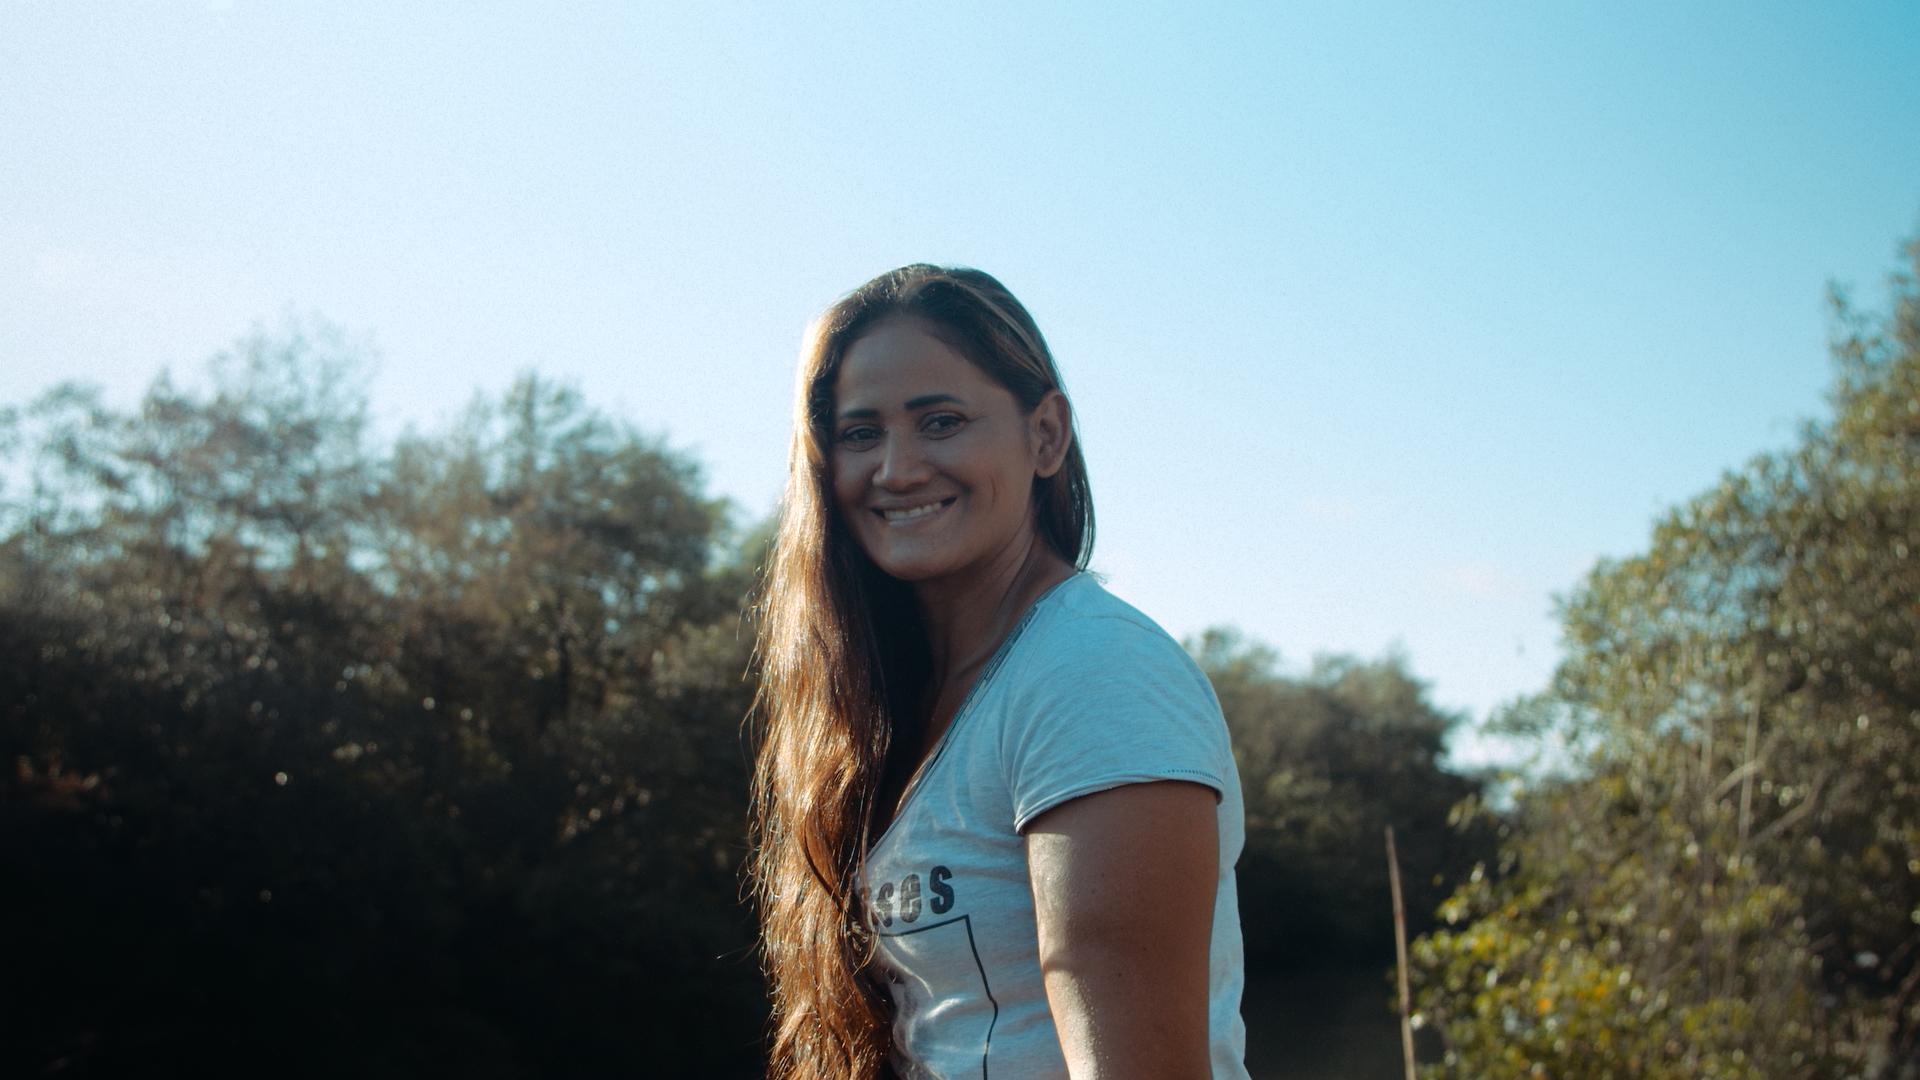 Valdenice, da Reserva Extrativista Caeté-Taperaçu, em Bragança